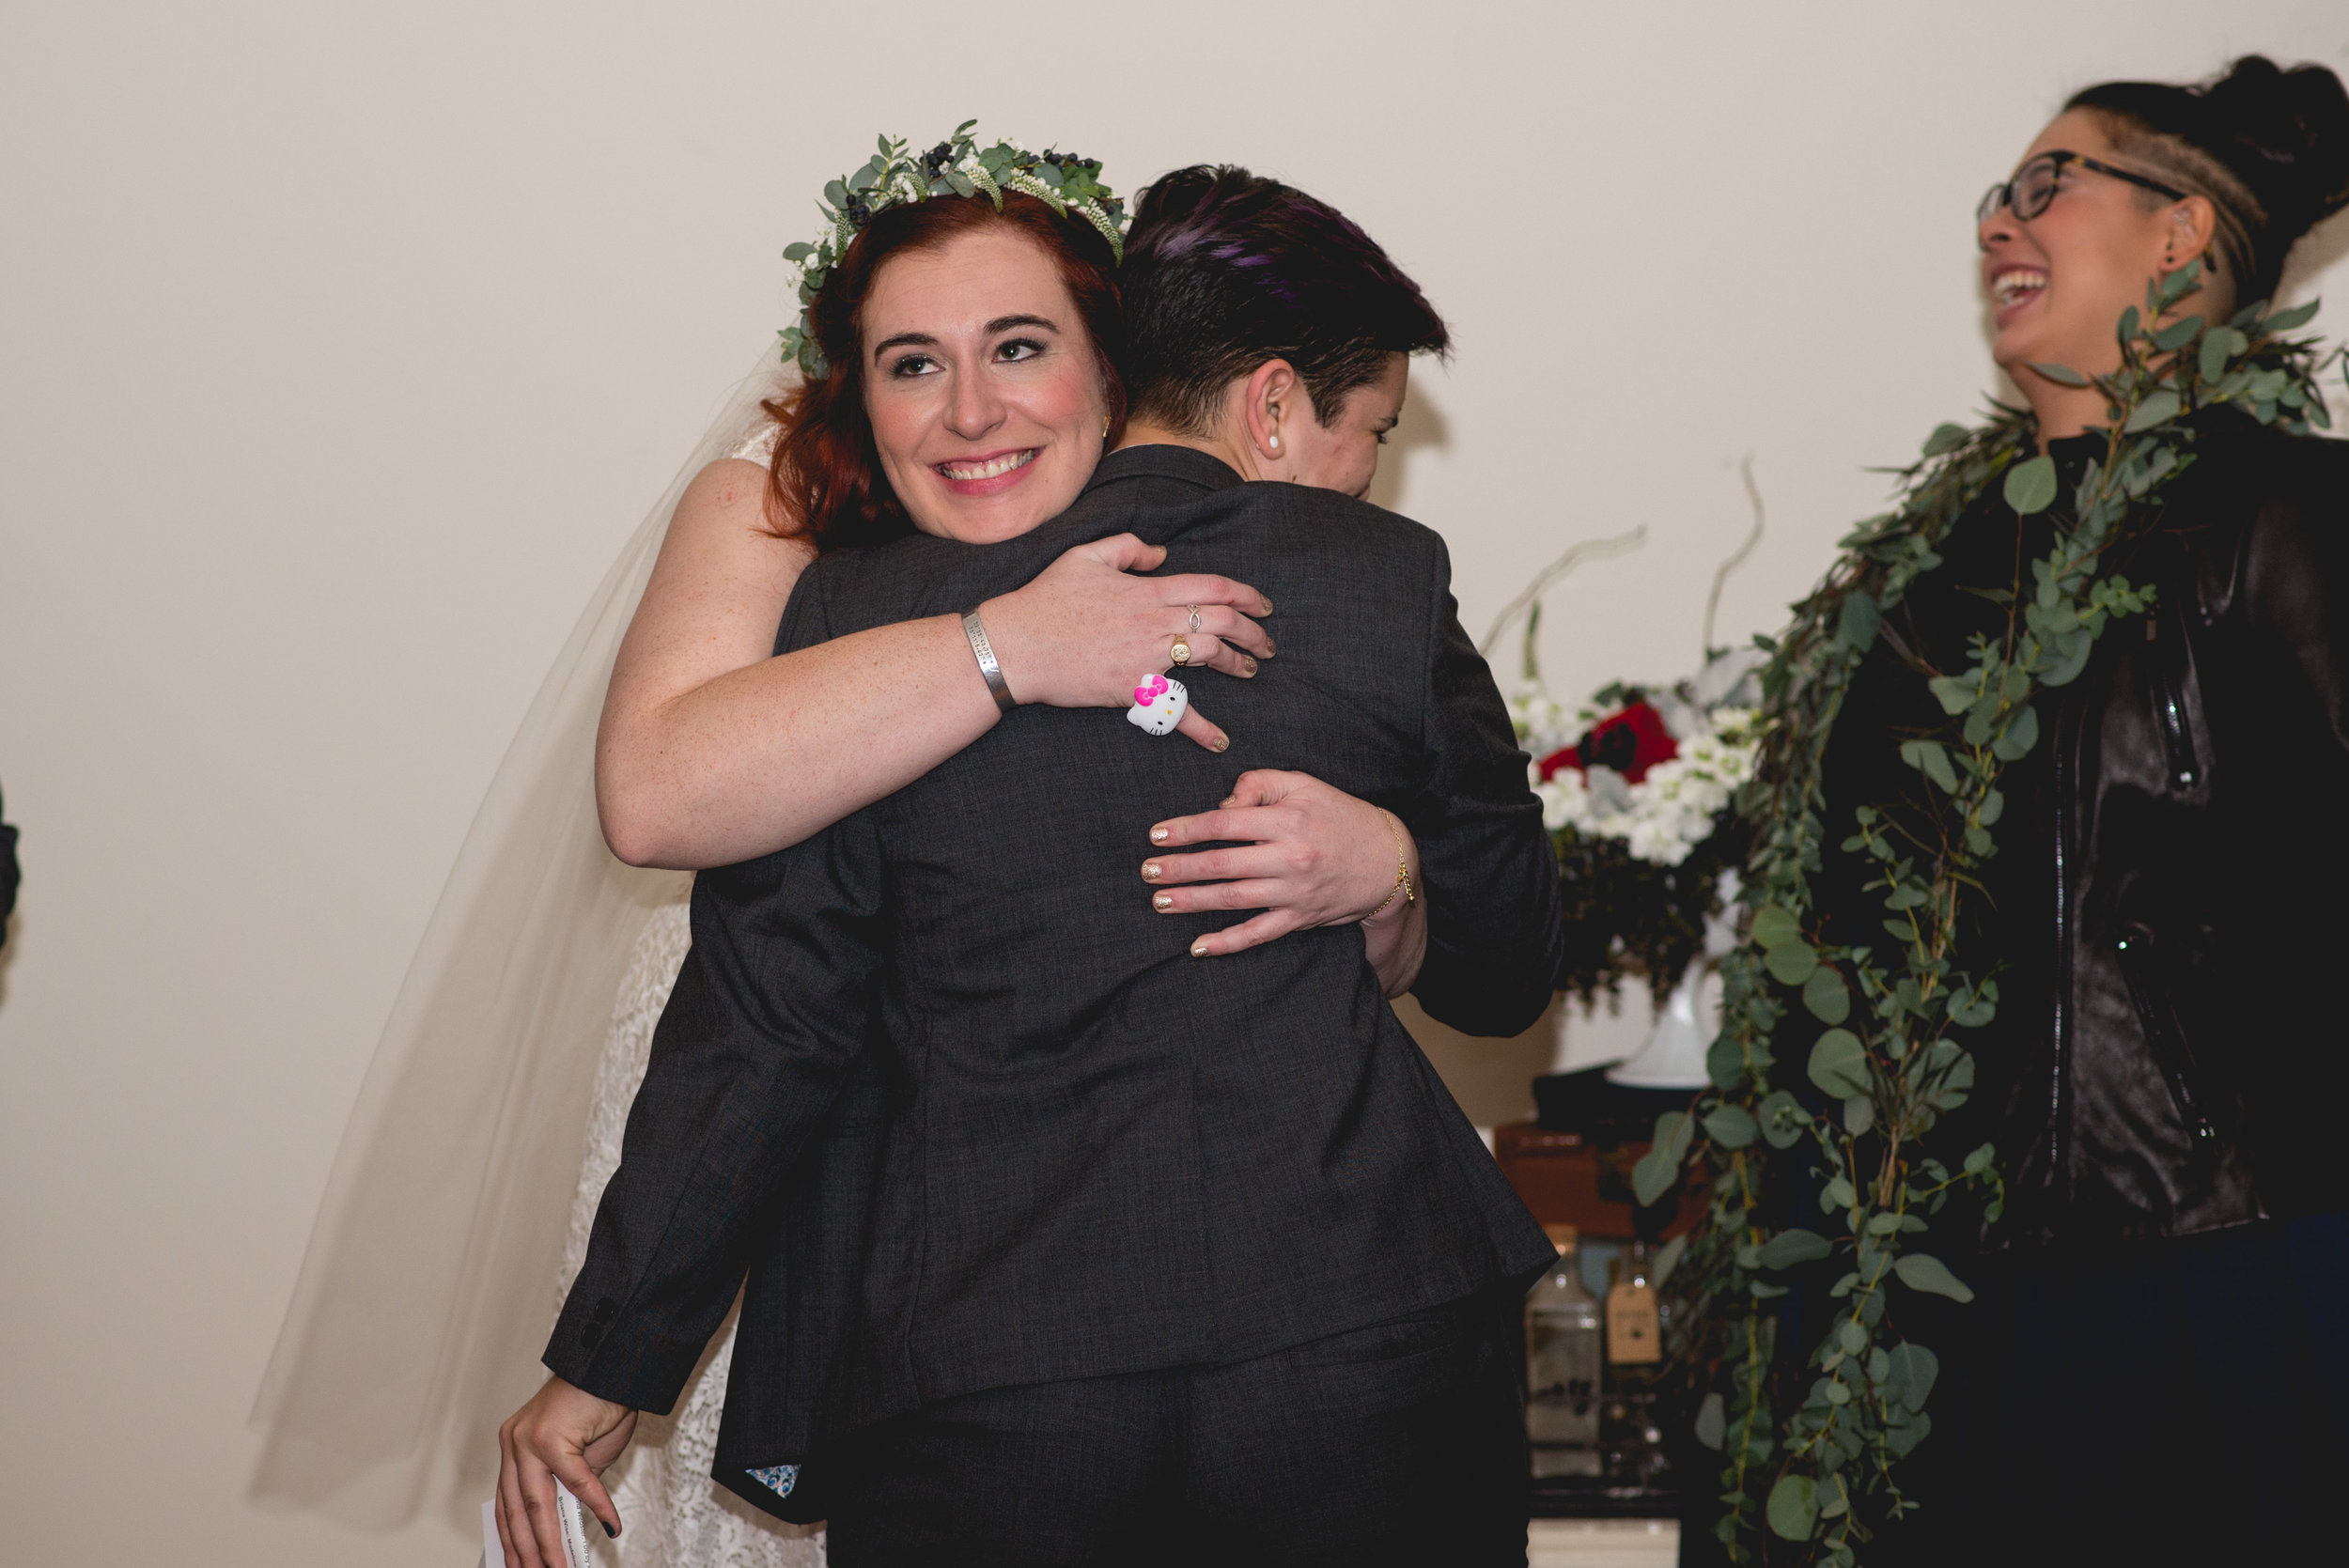 Patriotic LGBTQ Winter Styled Wedding 47